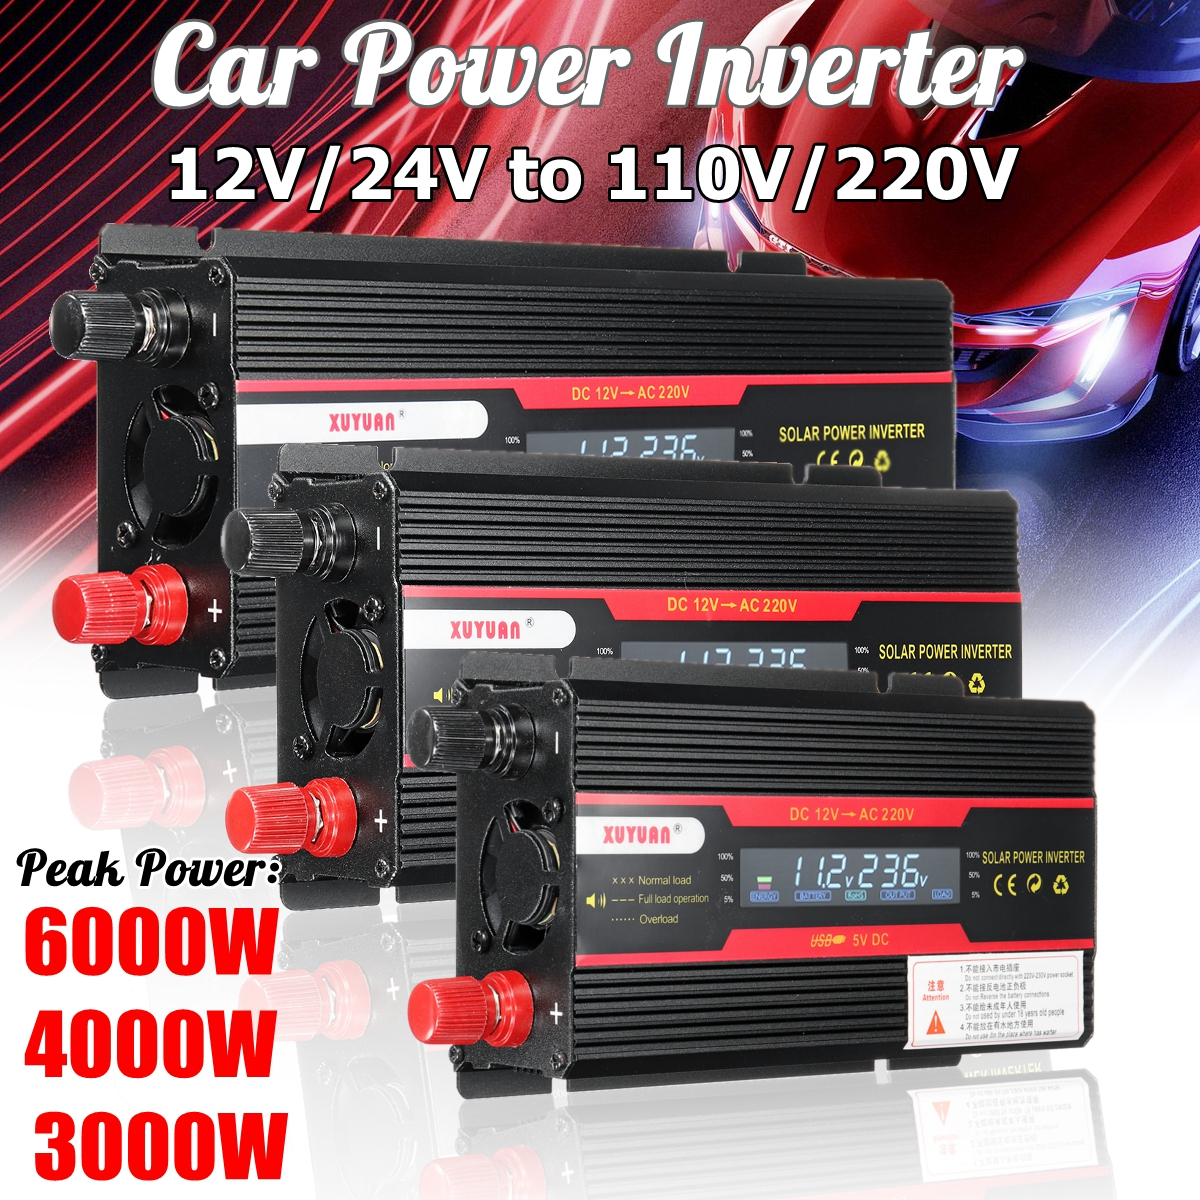 Car Inverter 12V 220V 3000W 4000W 6000W P eak Power Inverter Voltage Convertor Transformer 12V 220V Inversor + LCD DisplayCar Inverter 12V 220V 3000W 4000W 6000W P eak Power Inverter Voltage Convertor Transformer 12V 220V Inversor + LCD Display